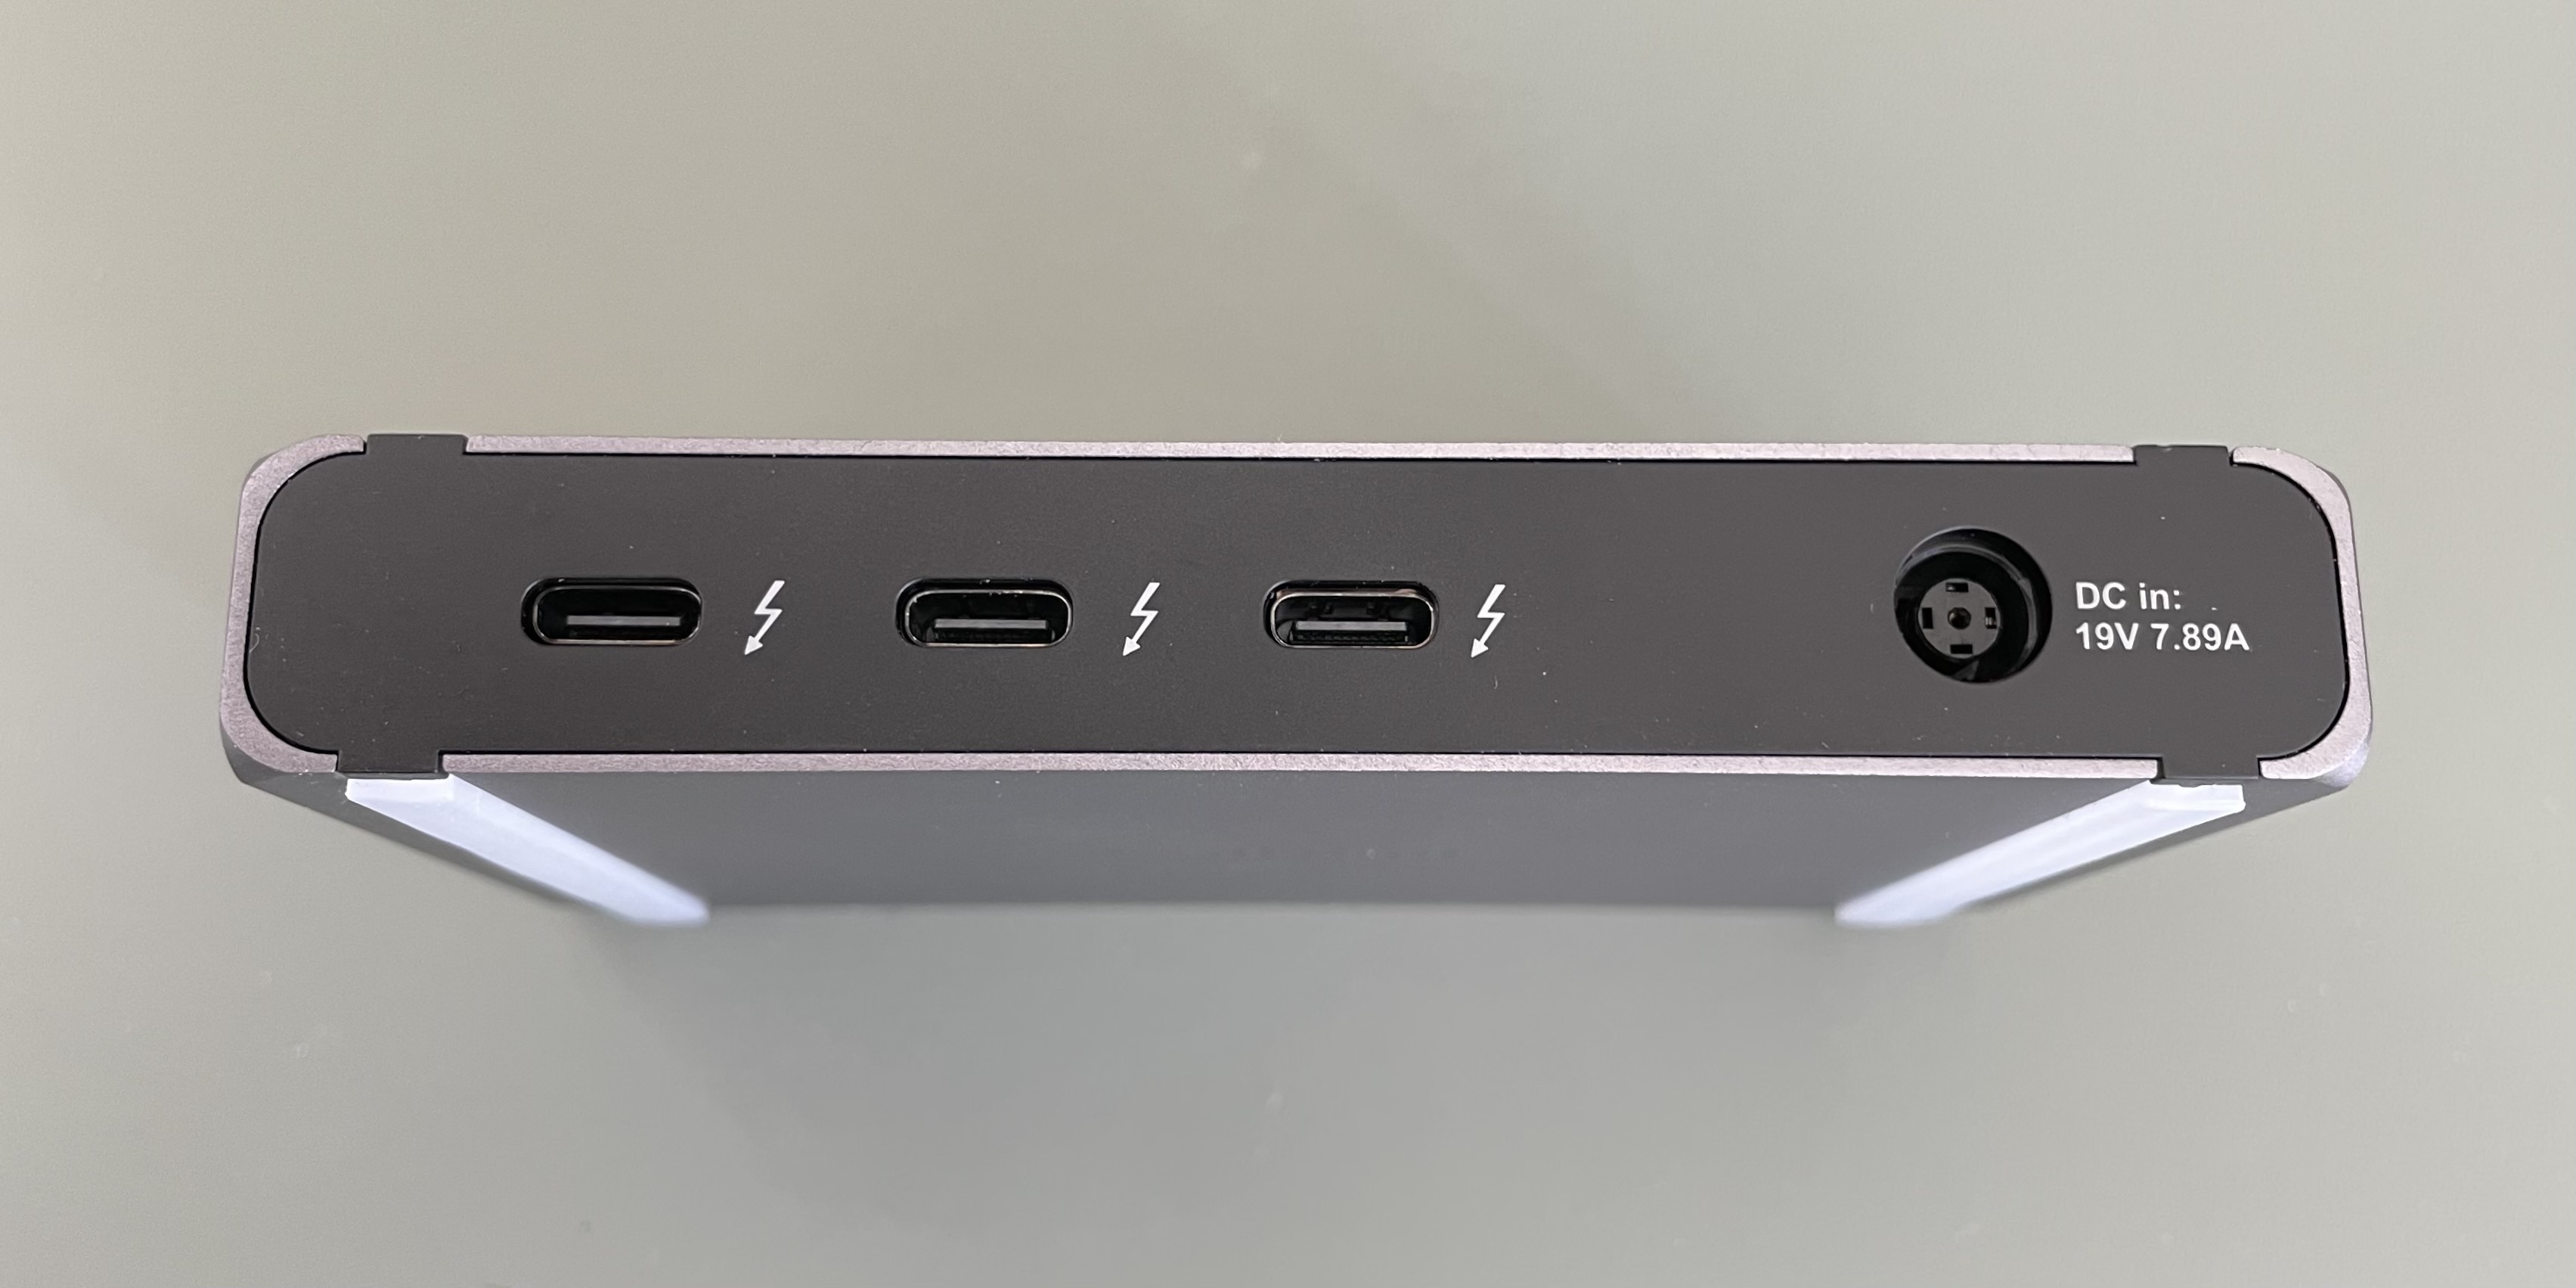 caldigit thunderbolt 4 hub macbook review reversible 1